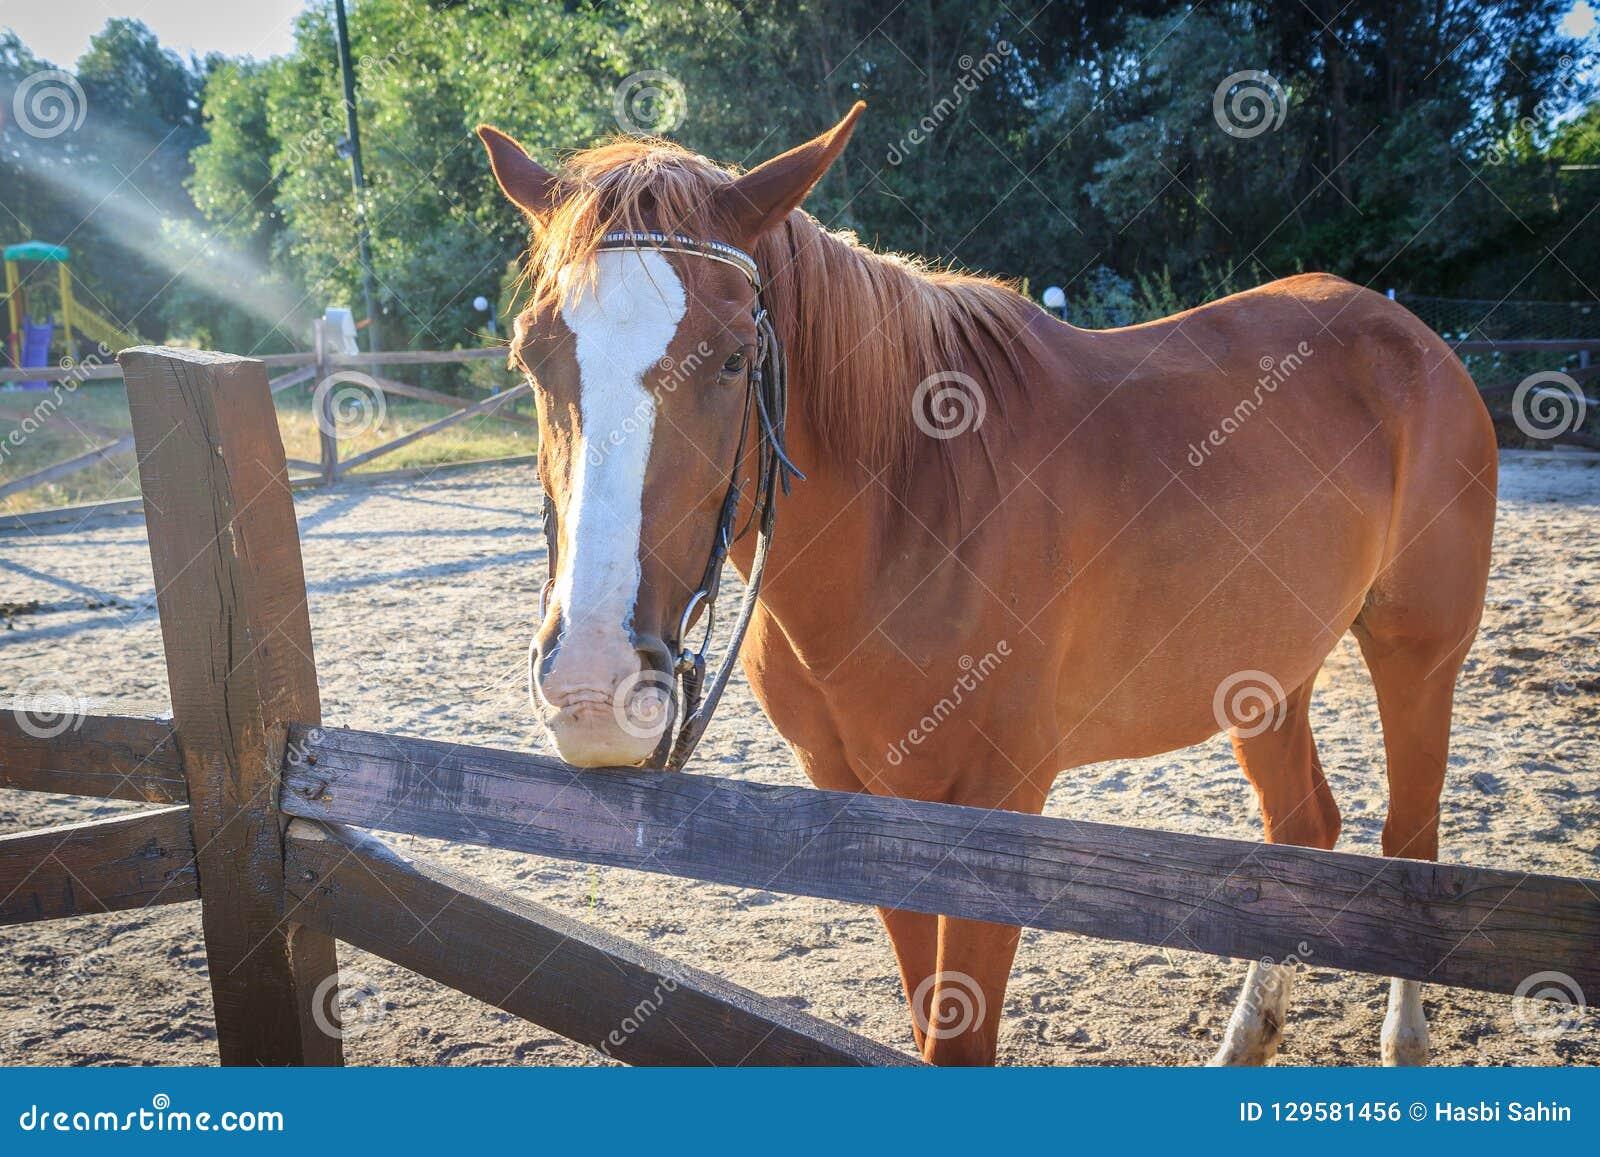 pas cher meilleur choix france pas cher vente Brown horse in the manege stock photo. Image of activity ...